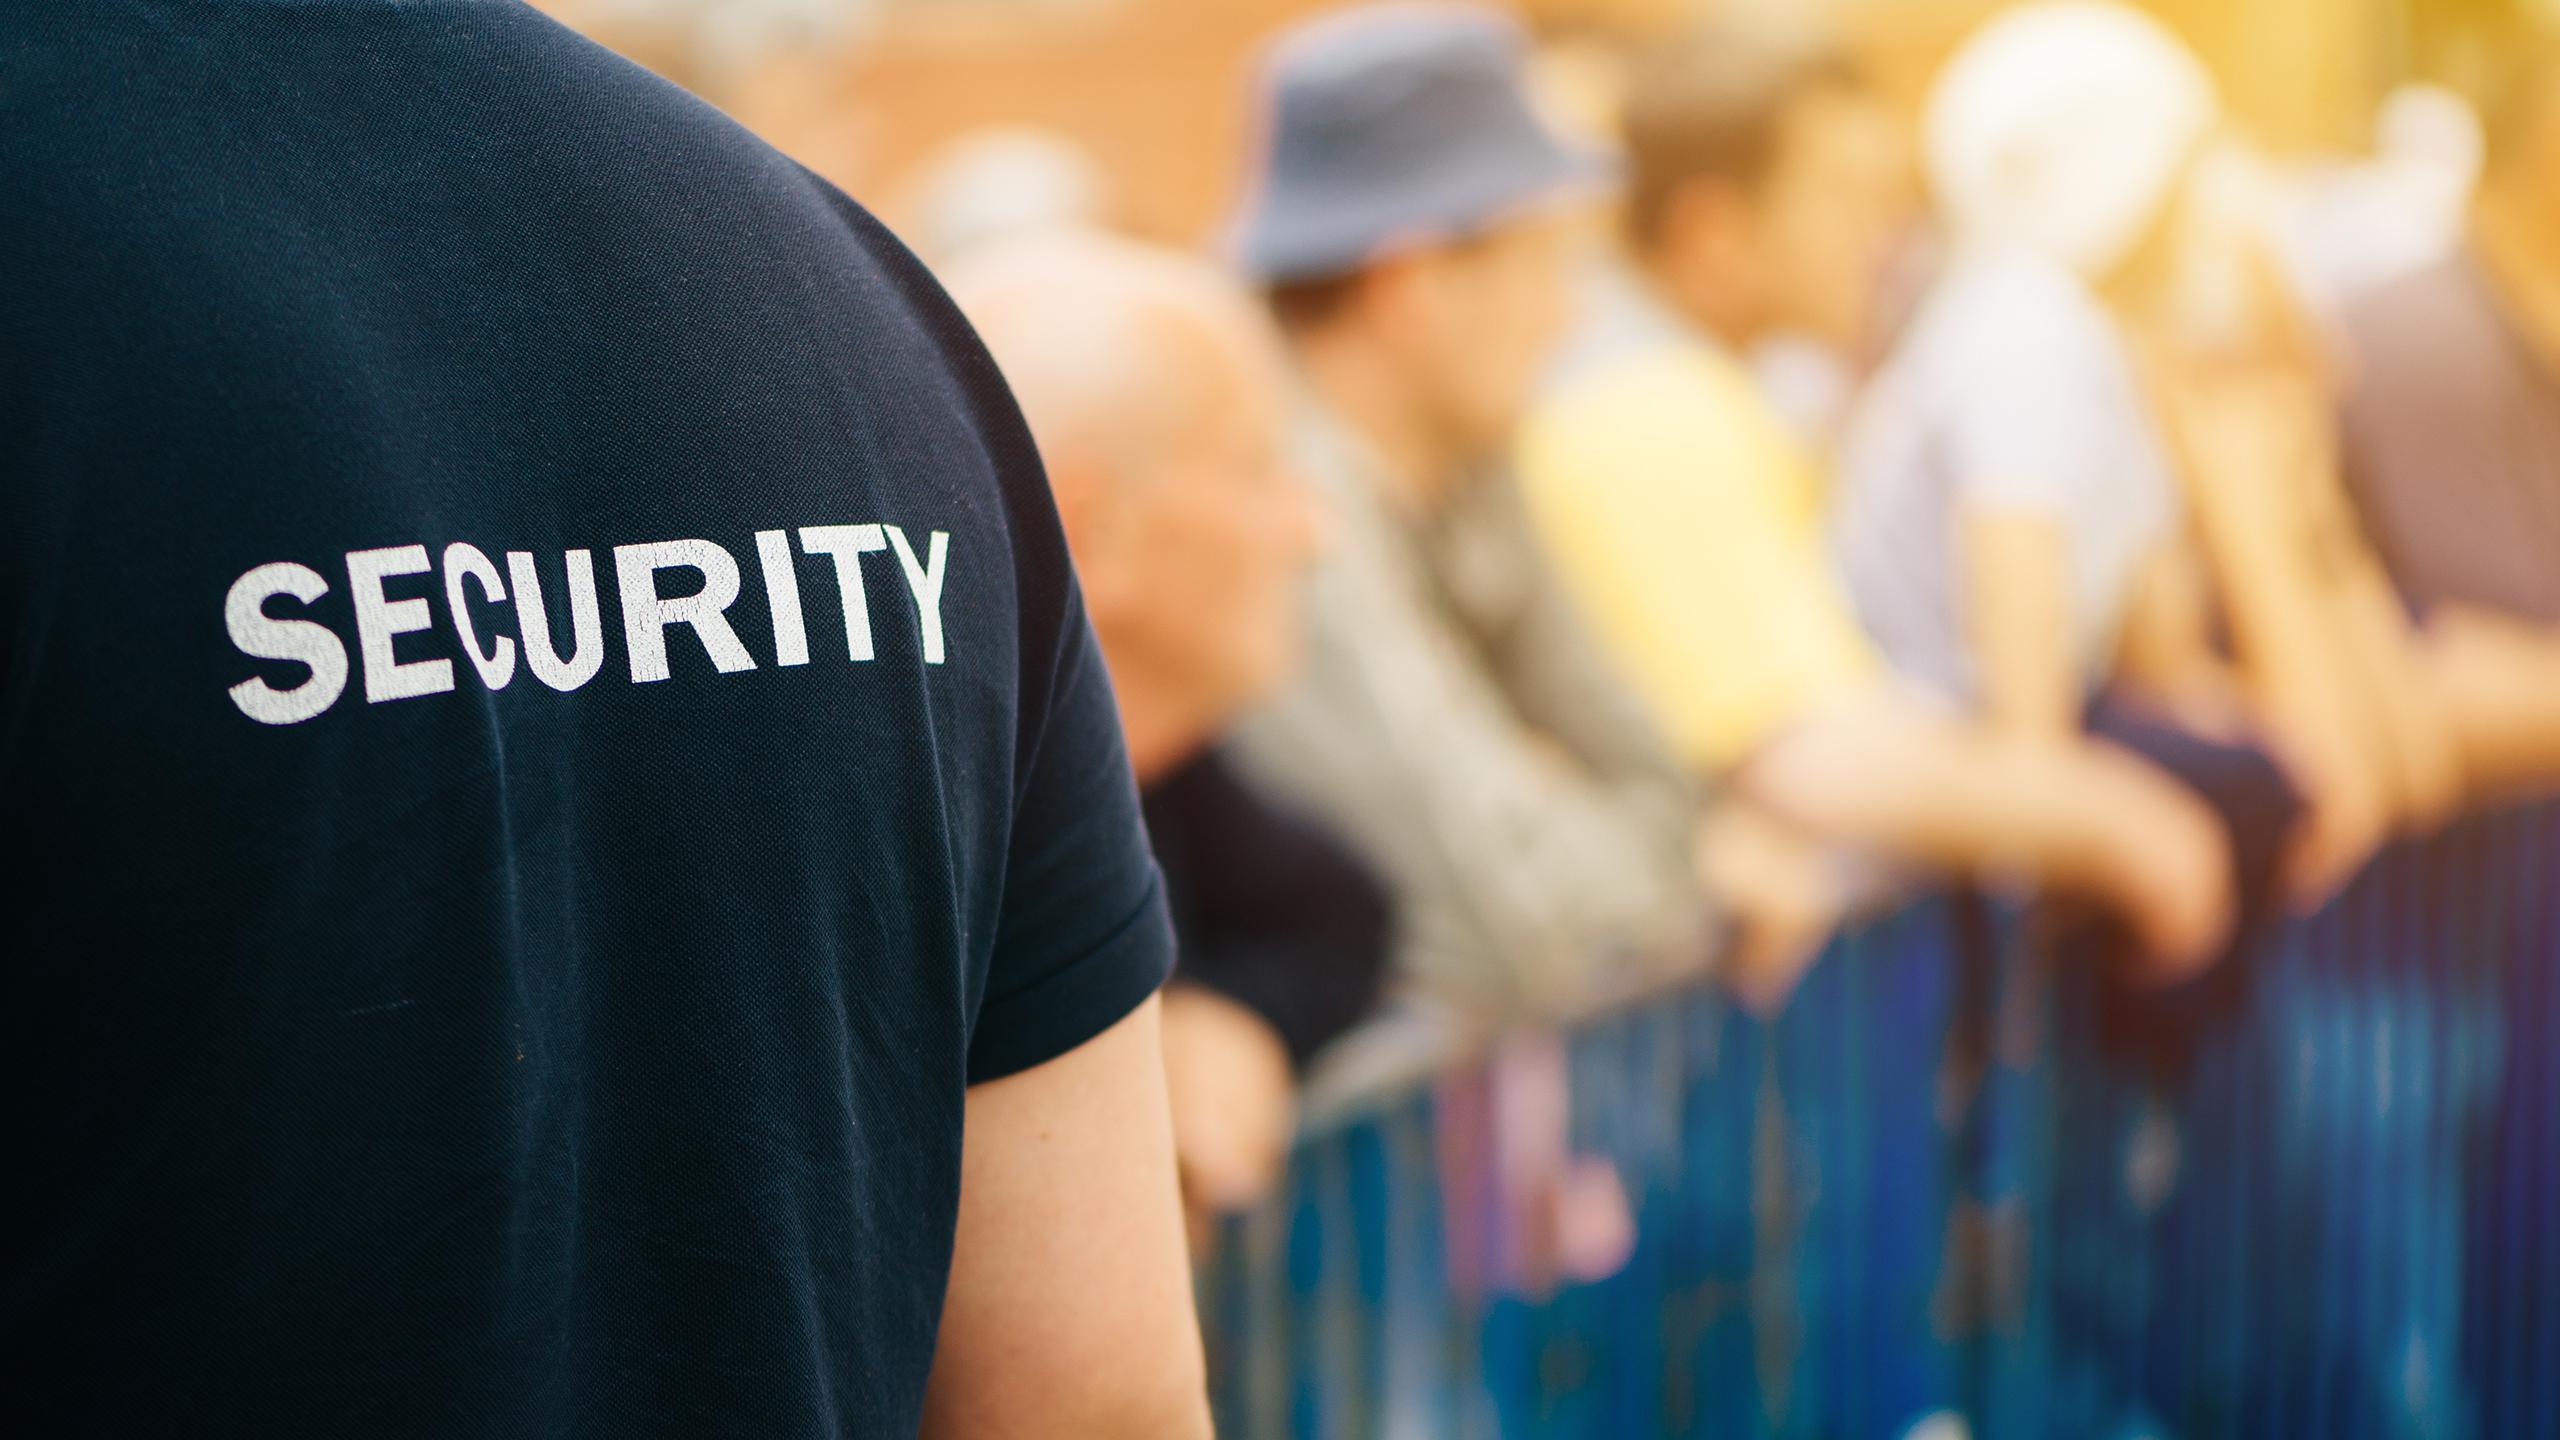 Security Services | Venue Security